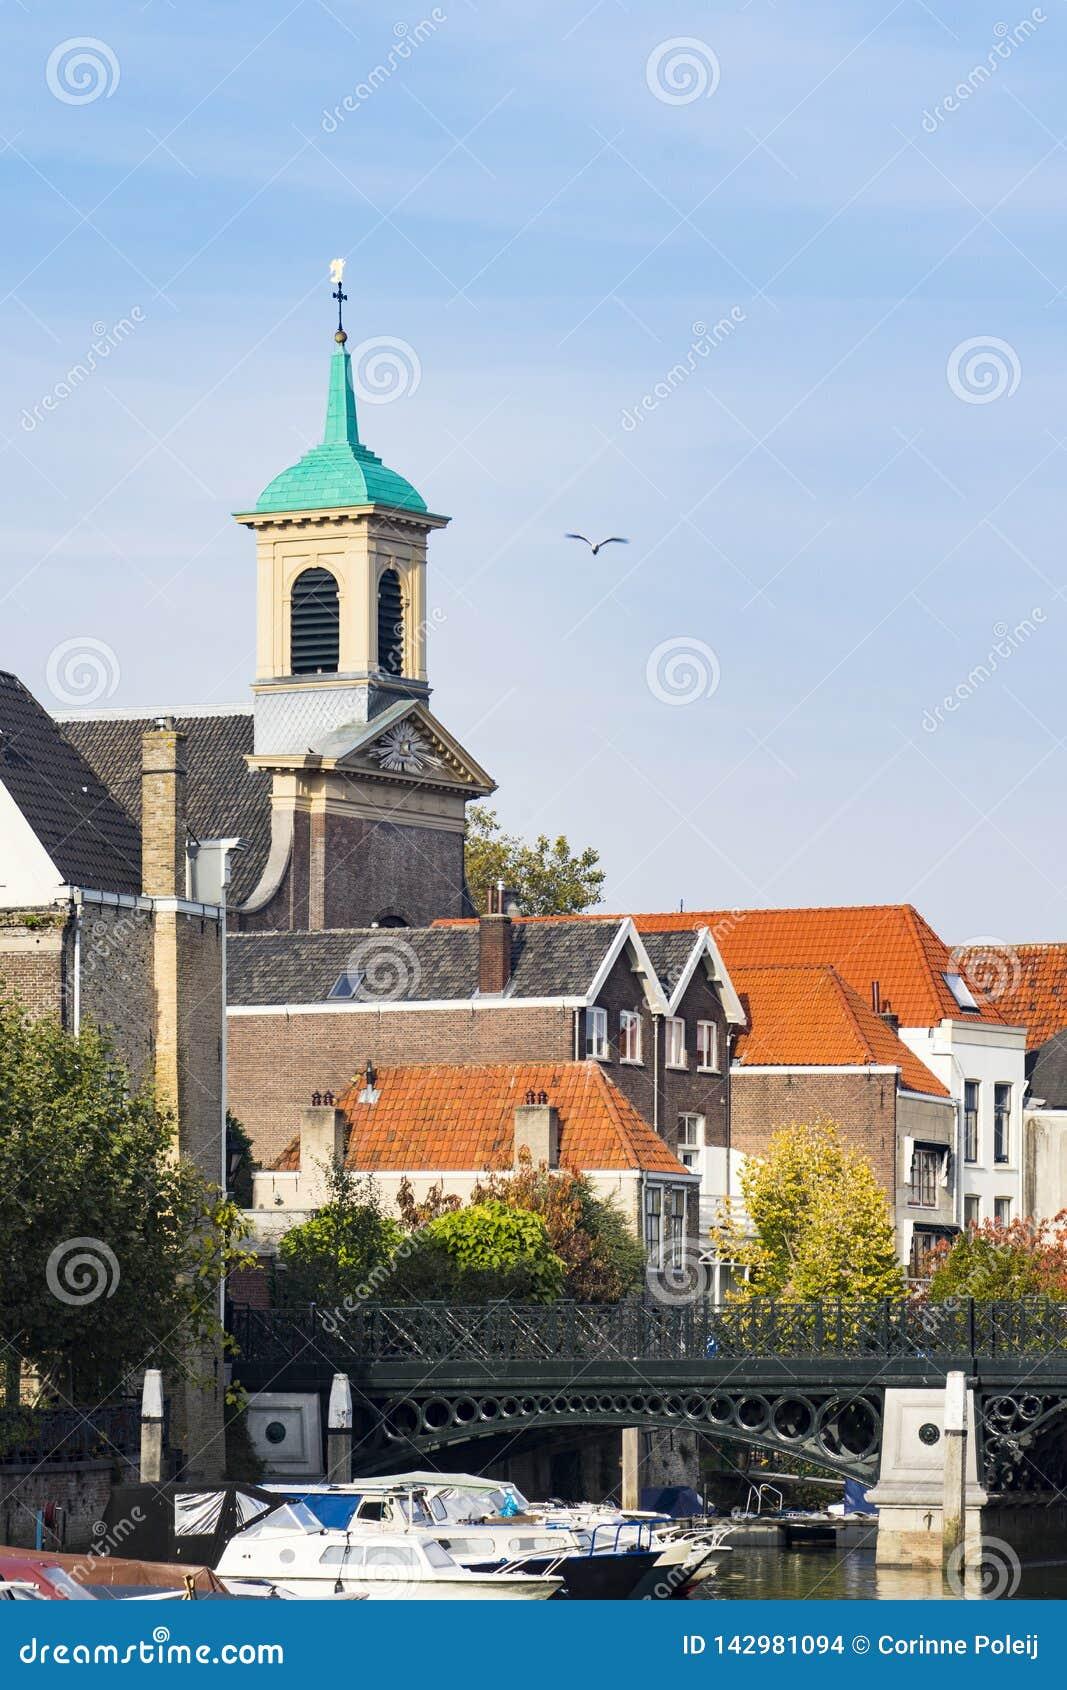 Sint Bonifatius church in Dordrecht, The Netherlands